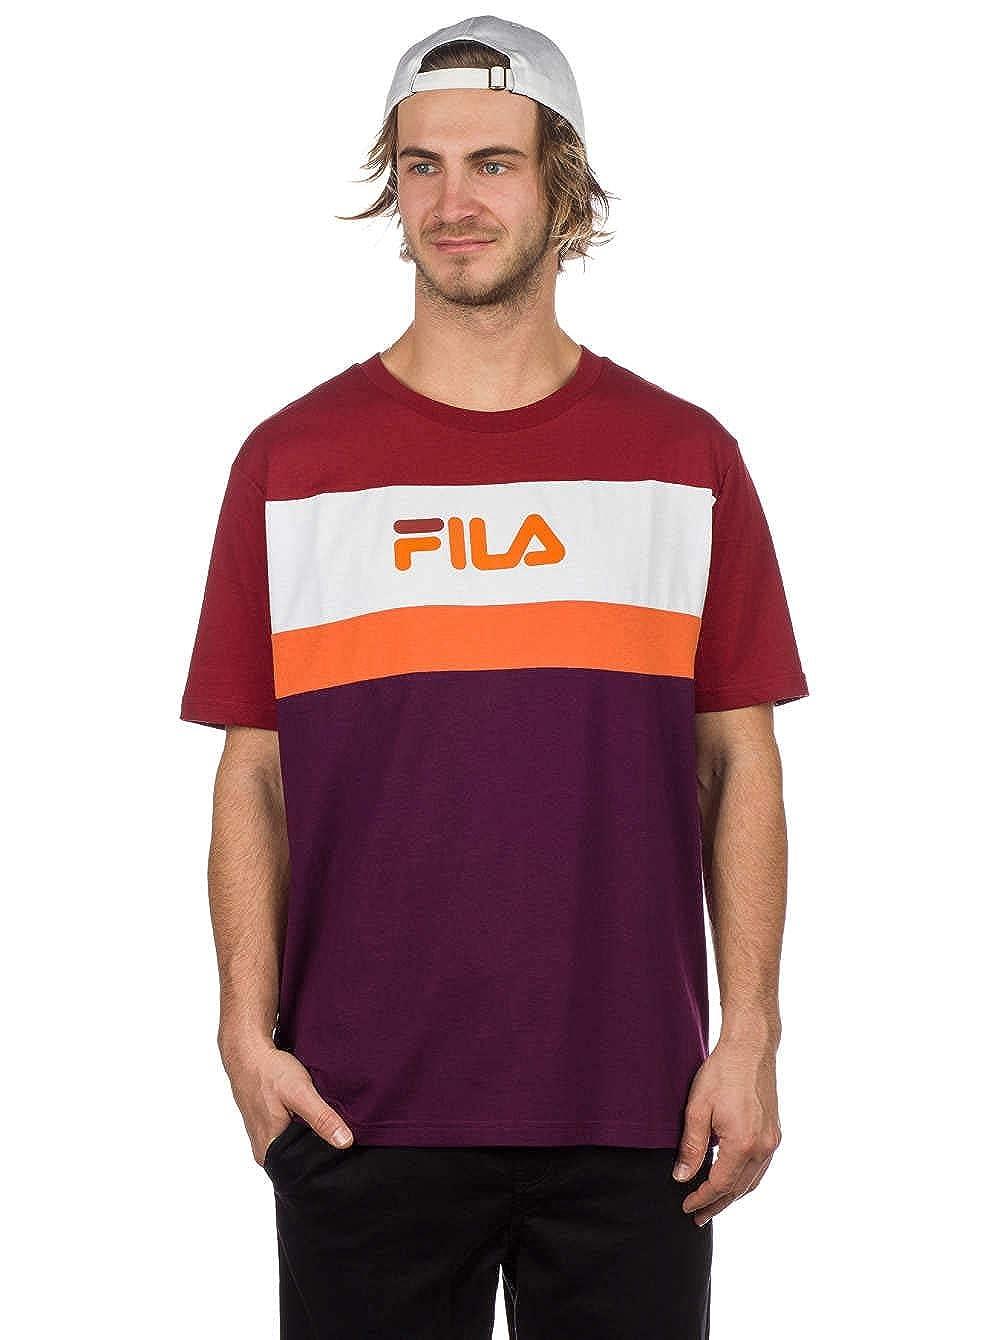 Fila Aaron Tee SS Men, T-Shirt B07KCTGJJ9 T-Shirts Auktion